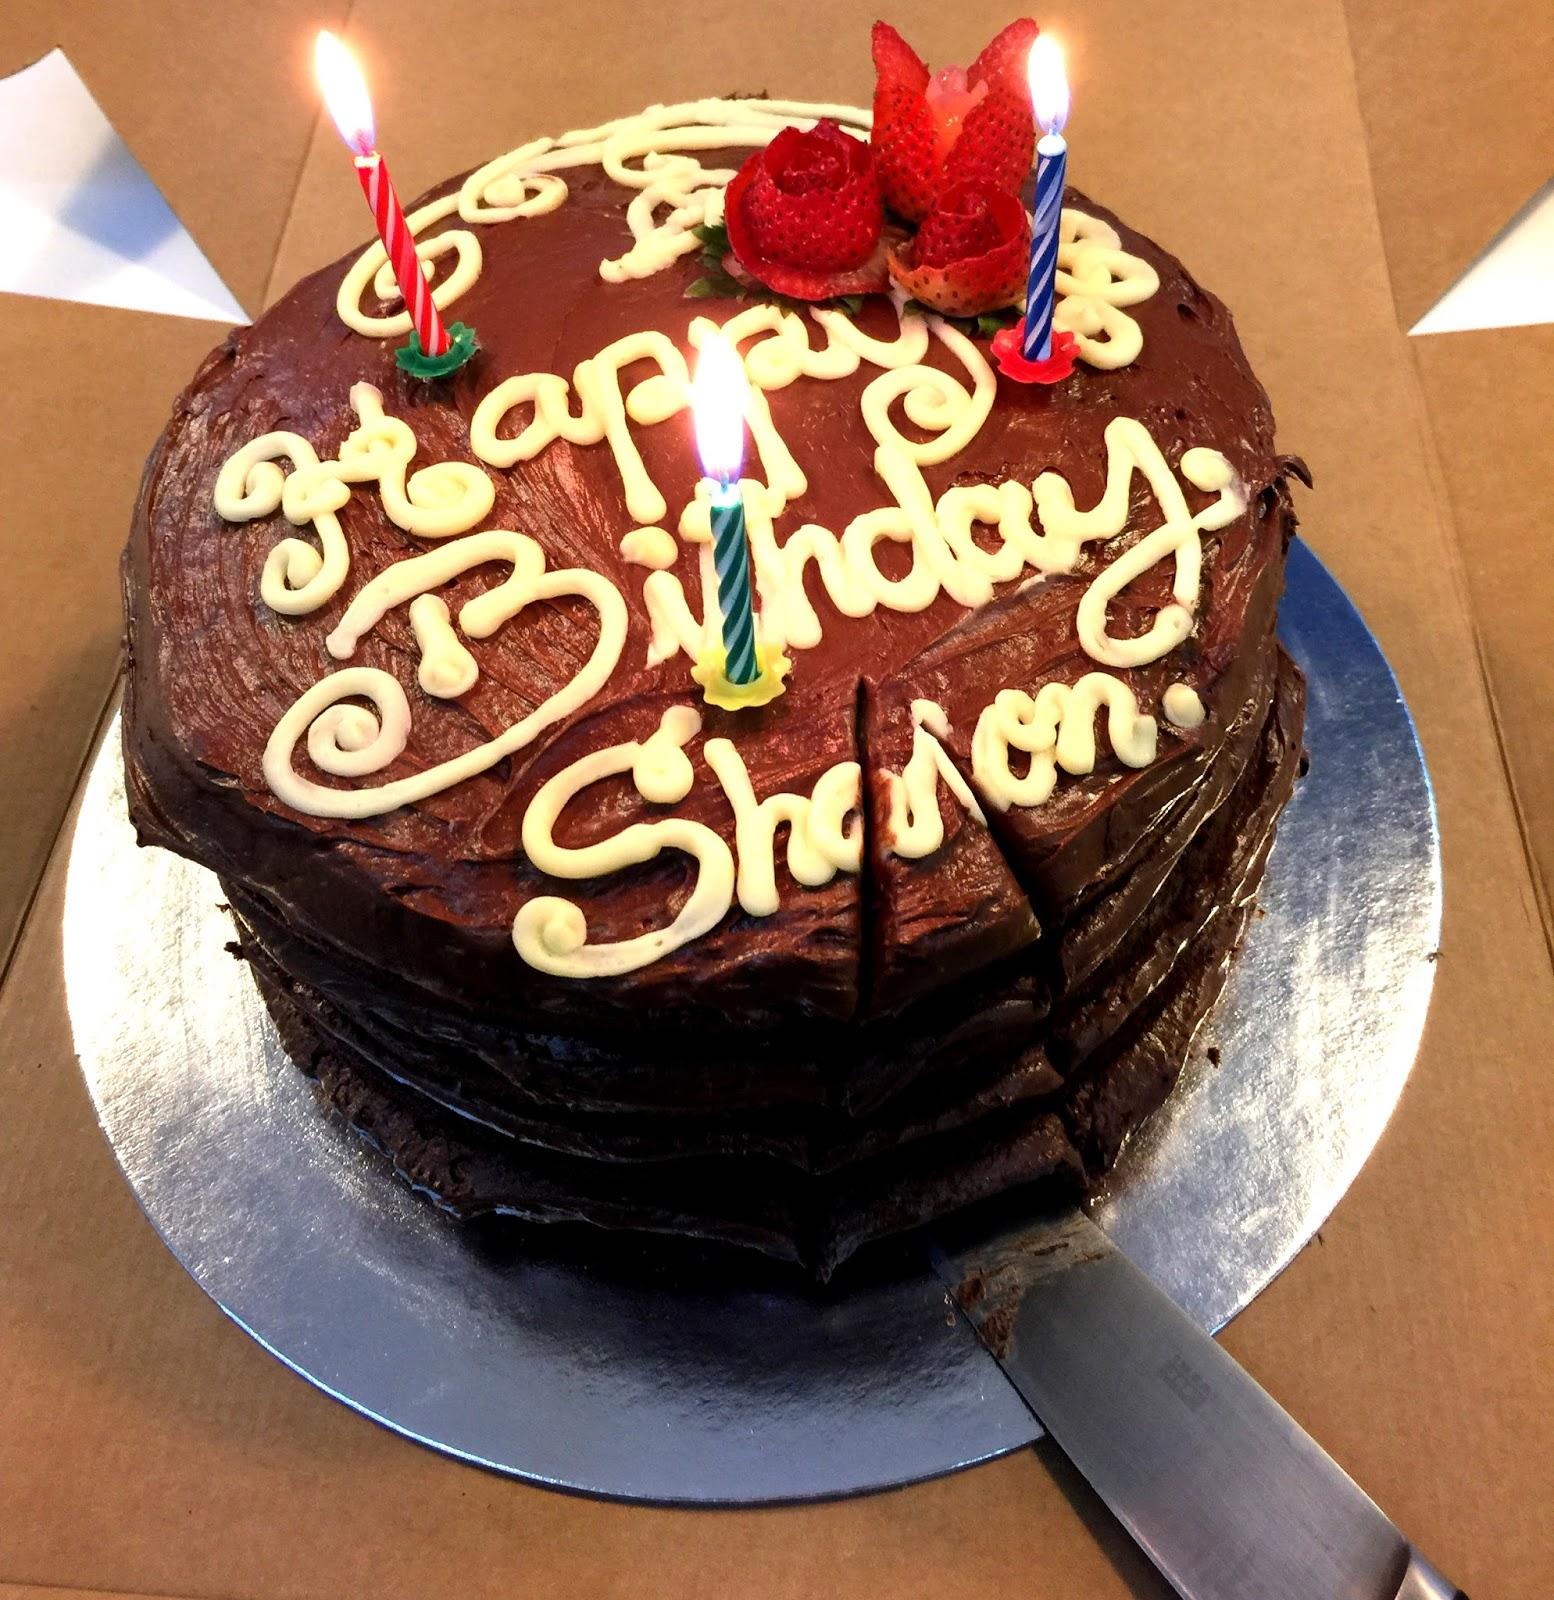 Best Chocolate Cake Dubai